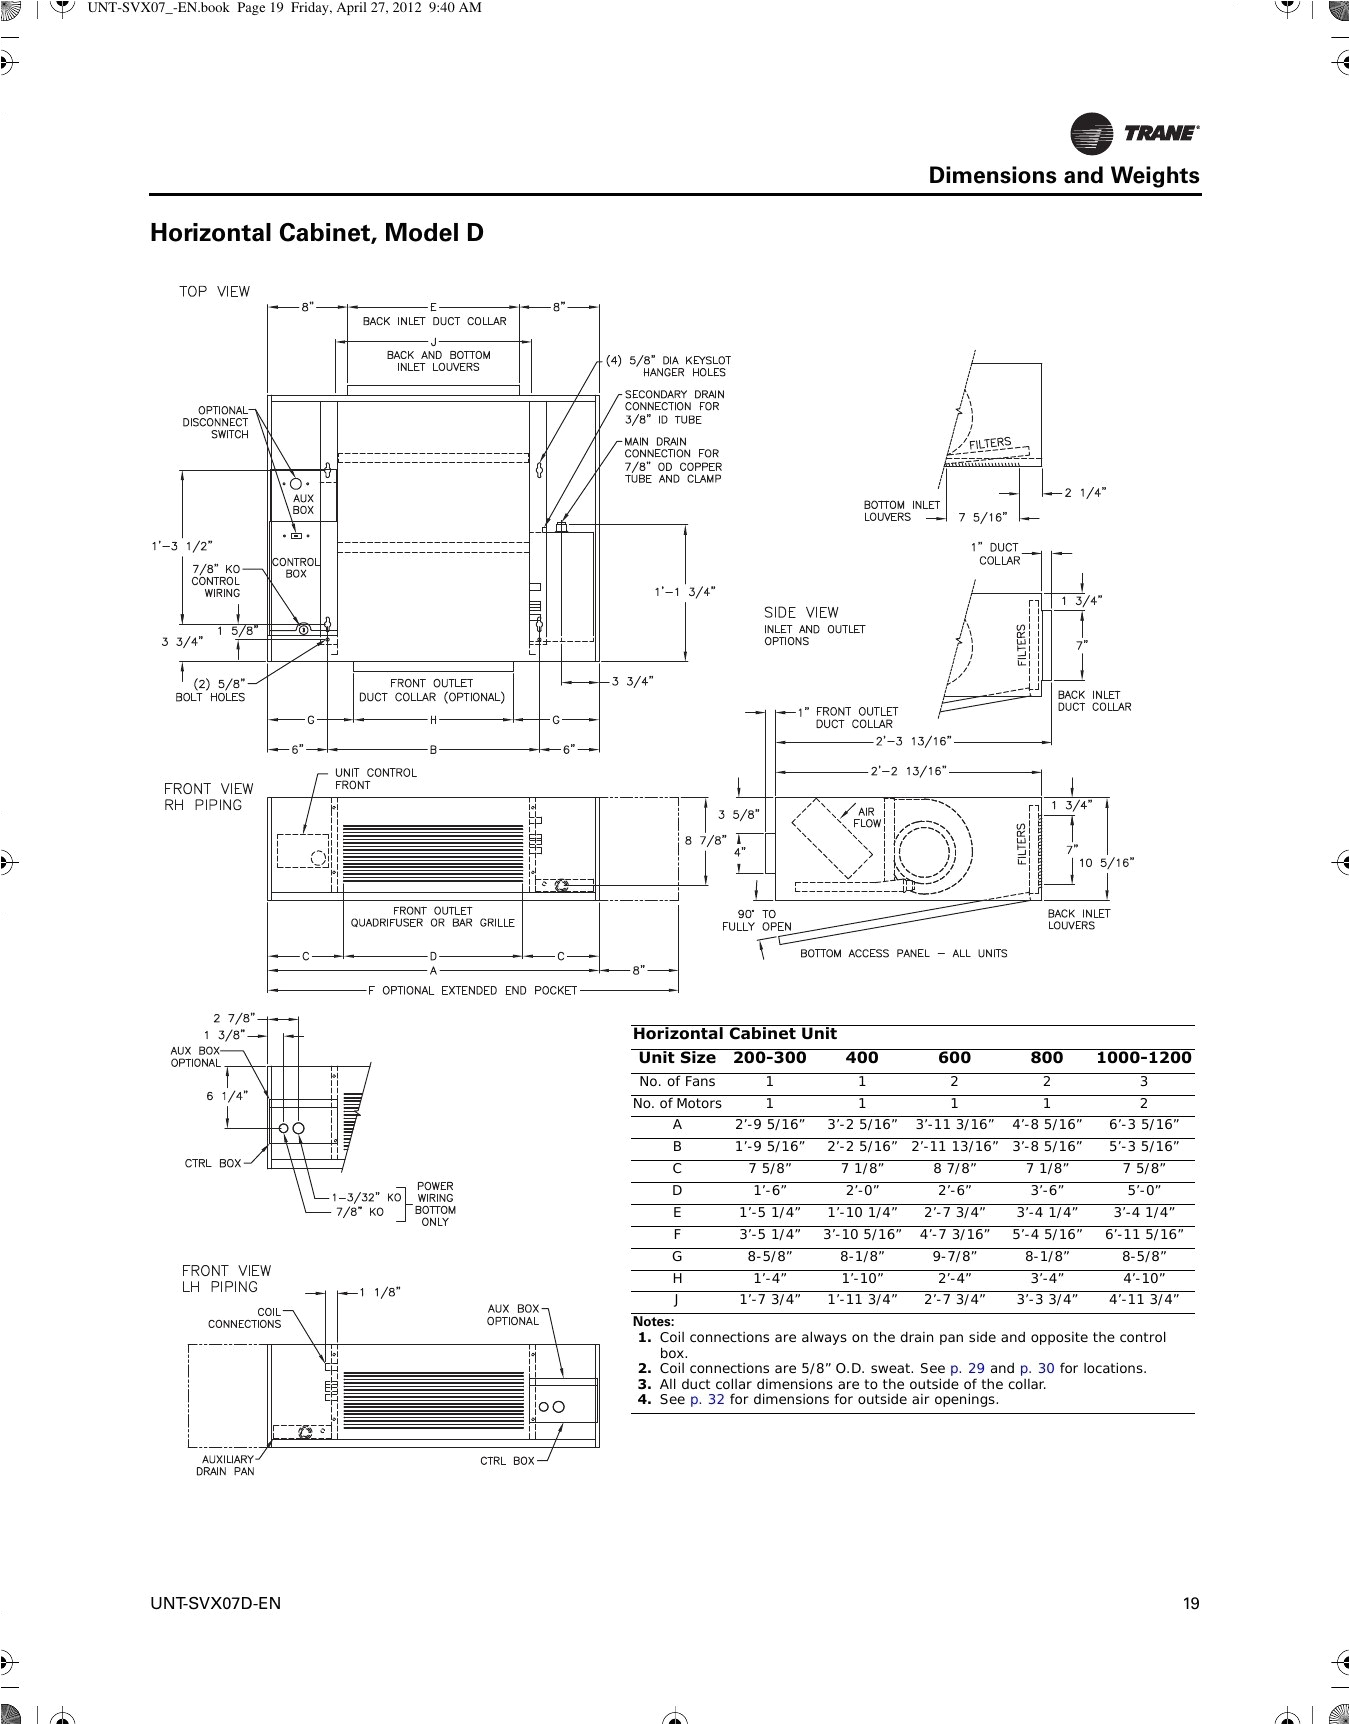 dometic comfort control center 2 wiring diagram